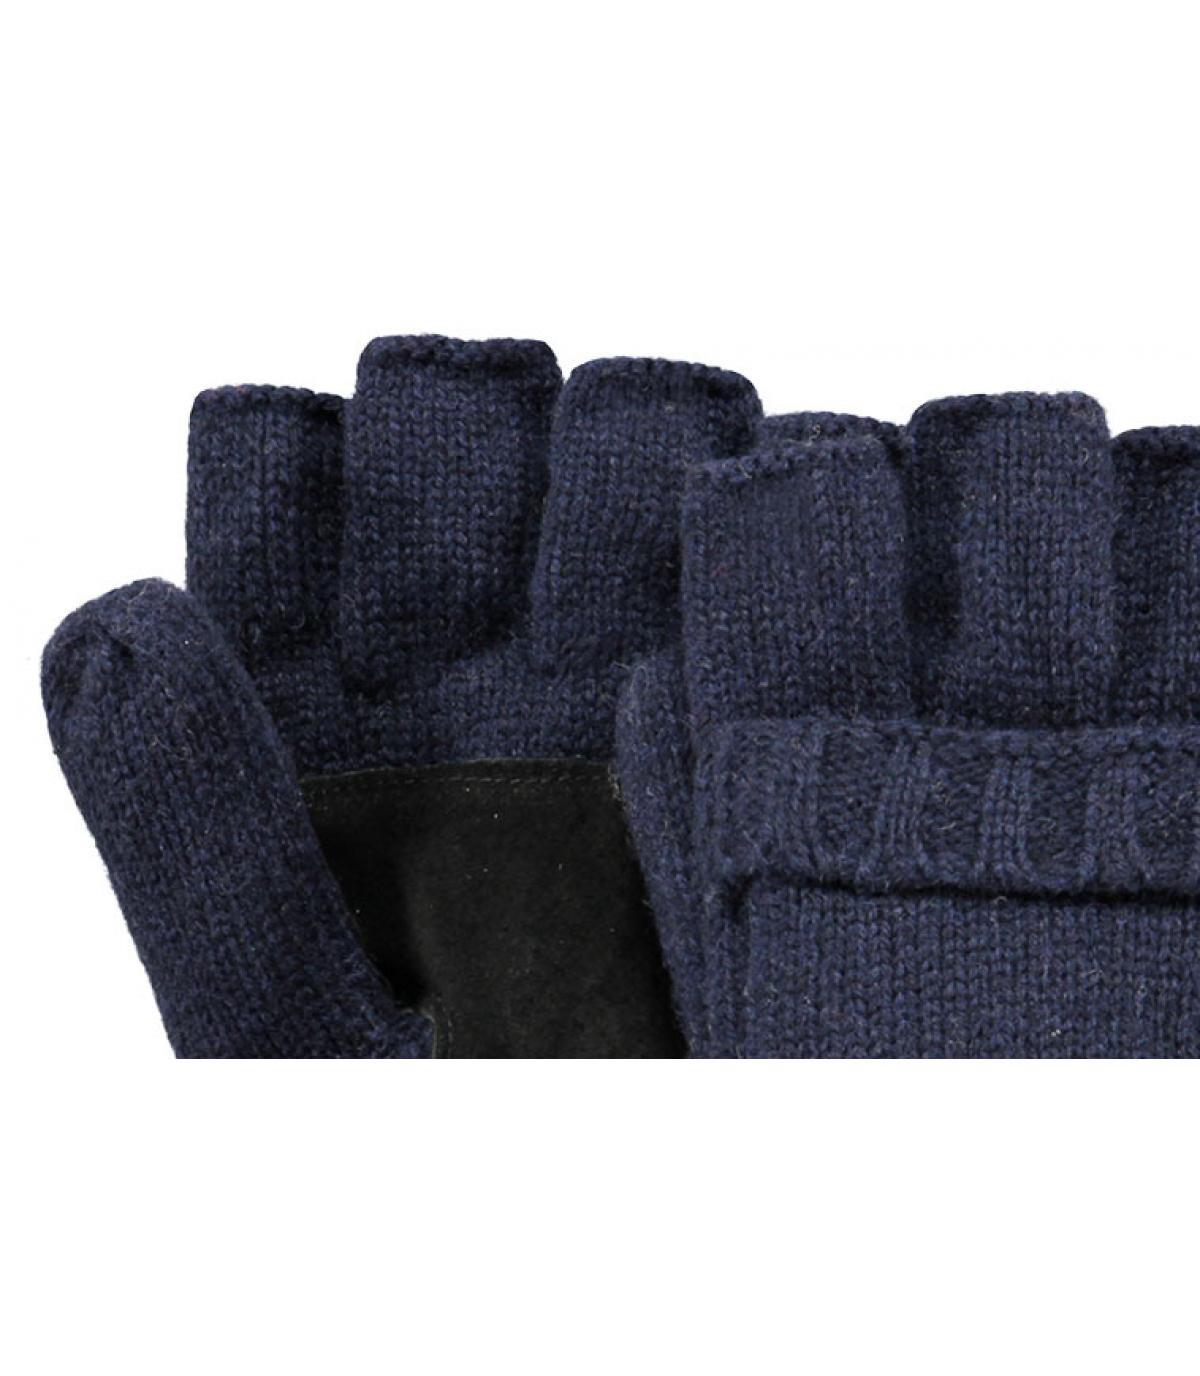 Details Haakon Handschuhe marineblau - Abbildung 2